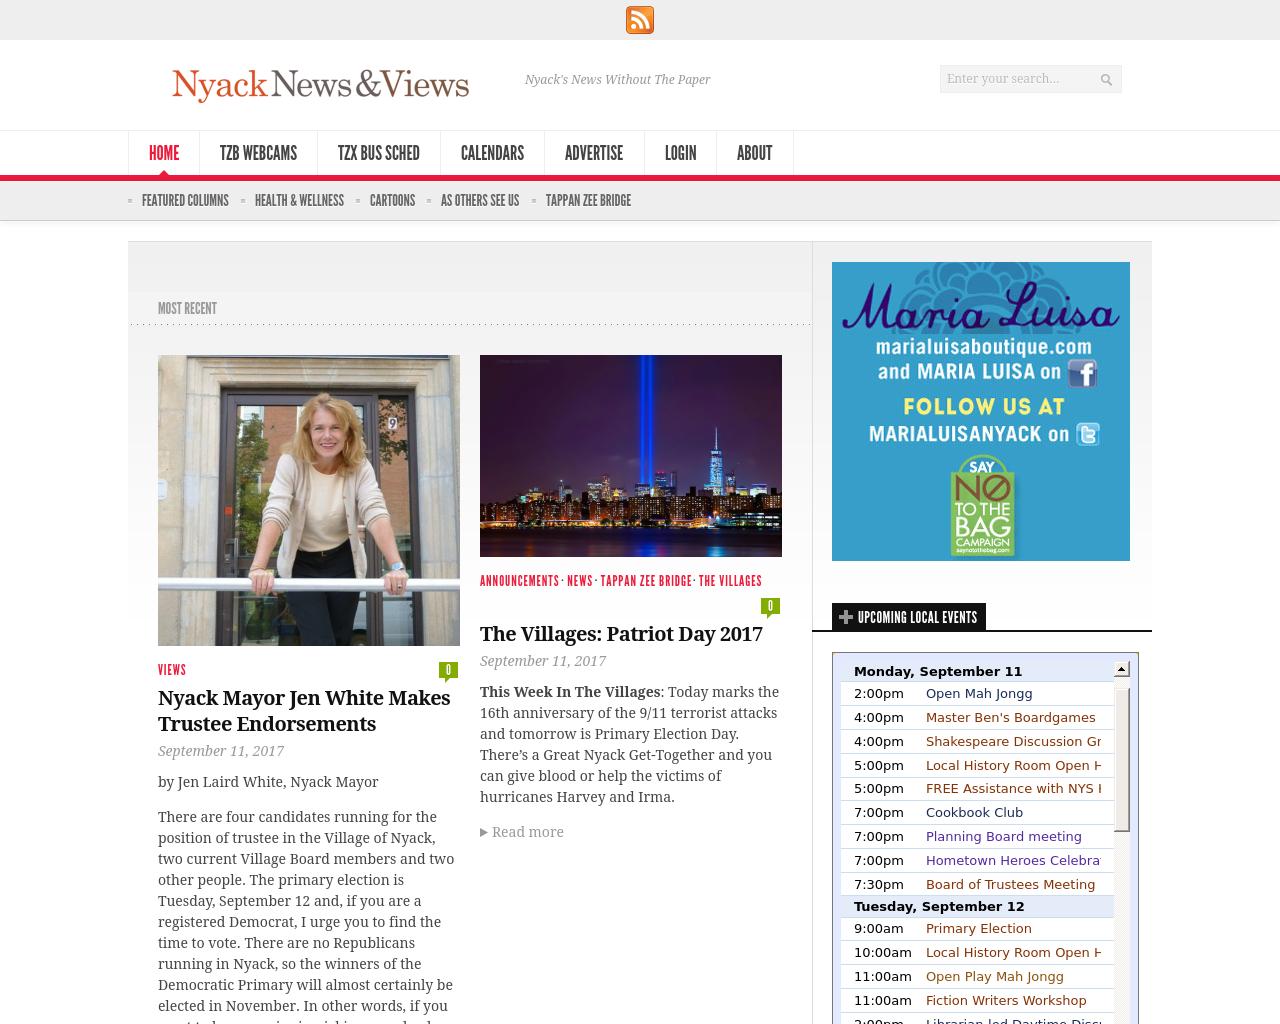 Nyack-News-&-Views-Advertising-Reviews-Pricing